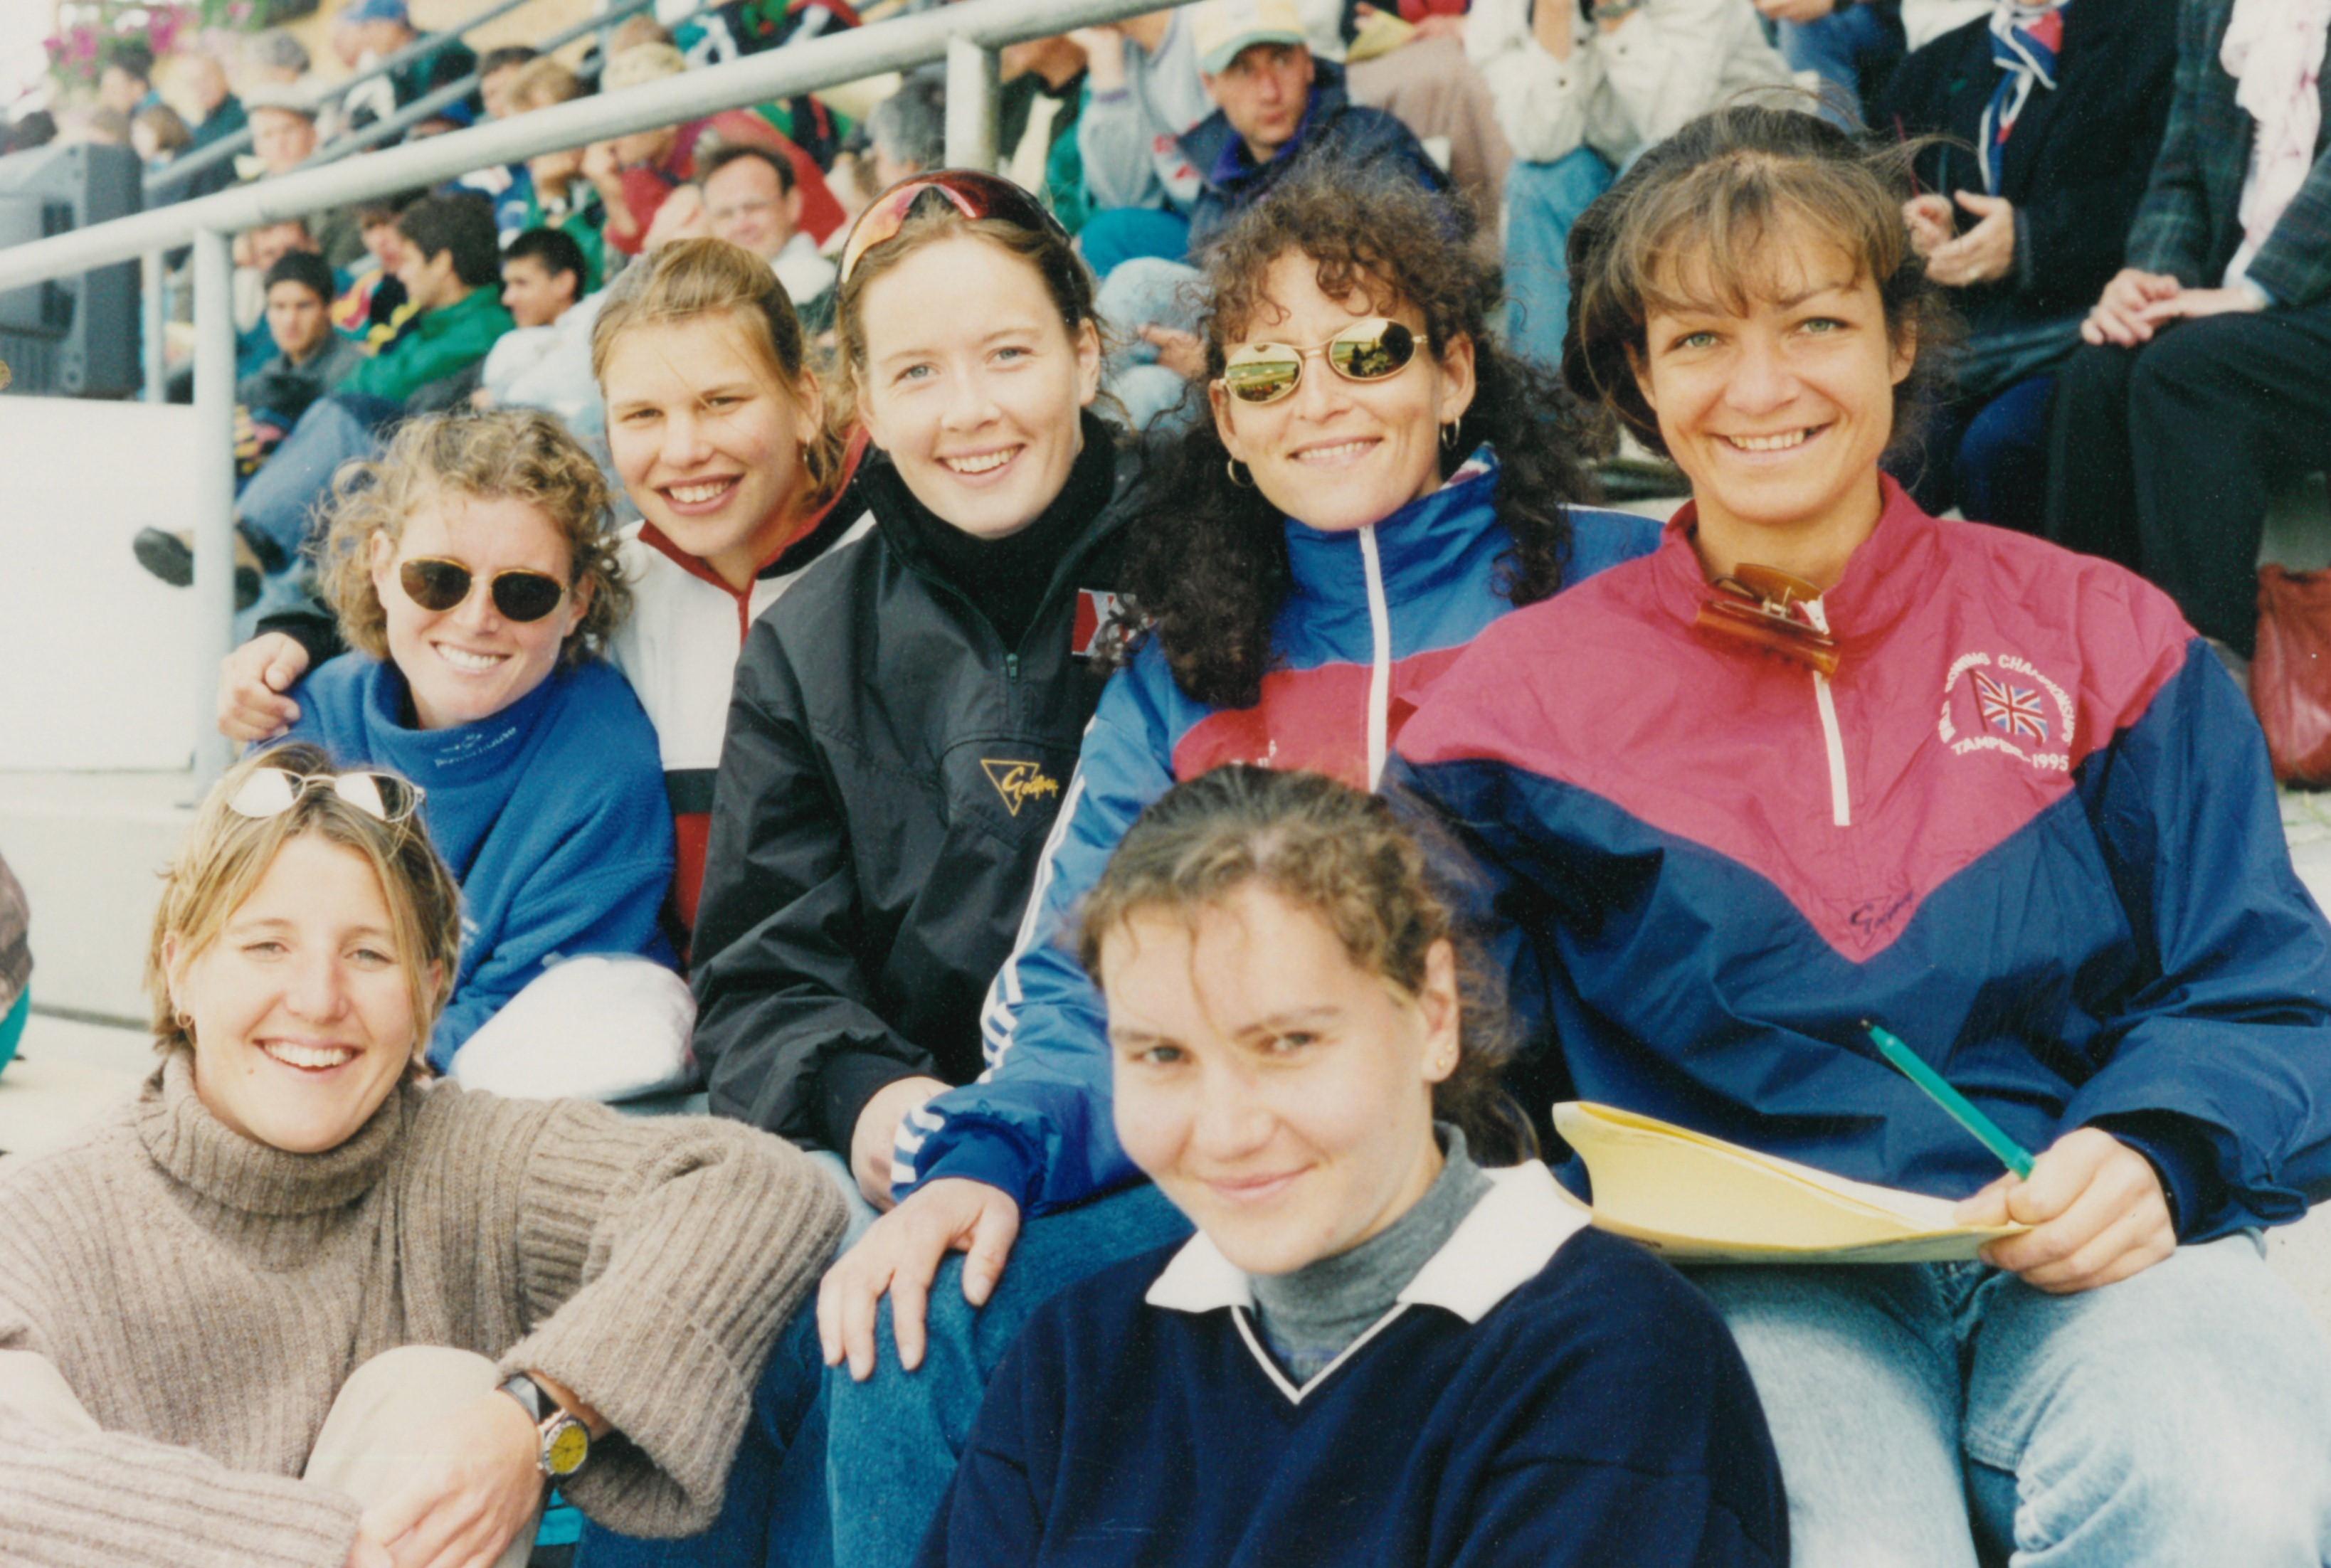 Women sitting in grandstand